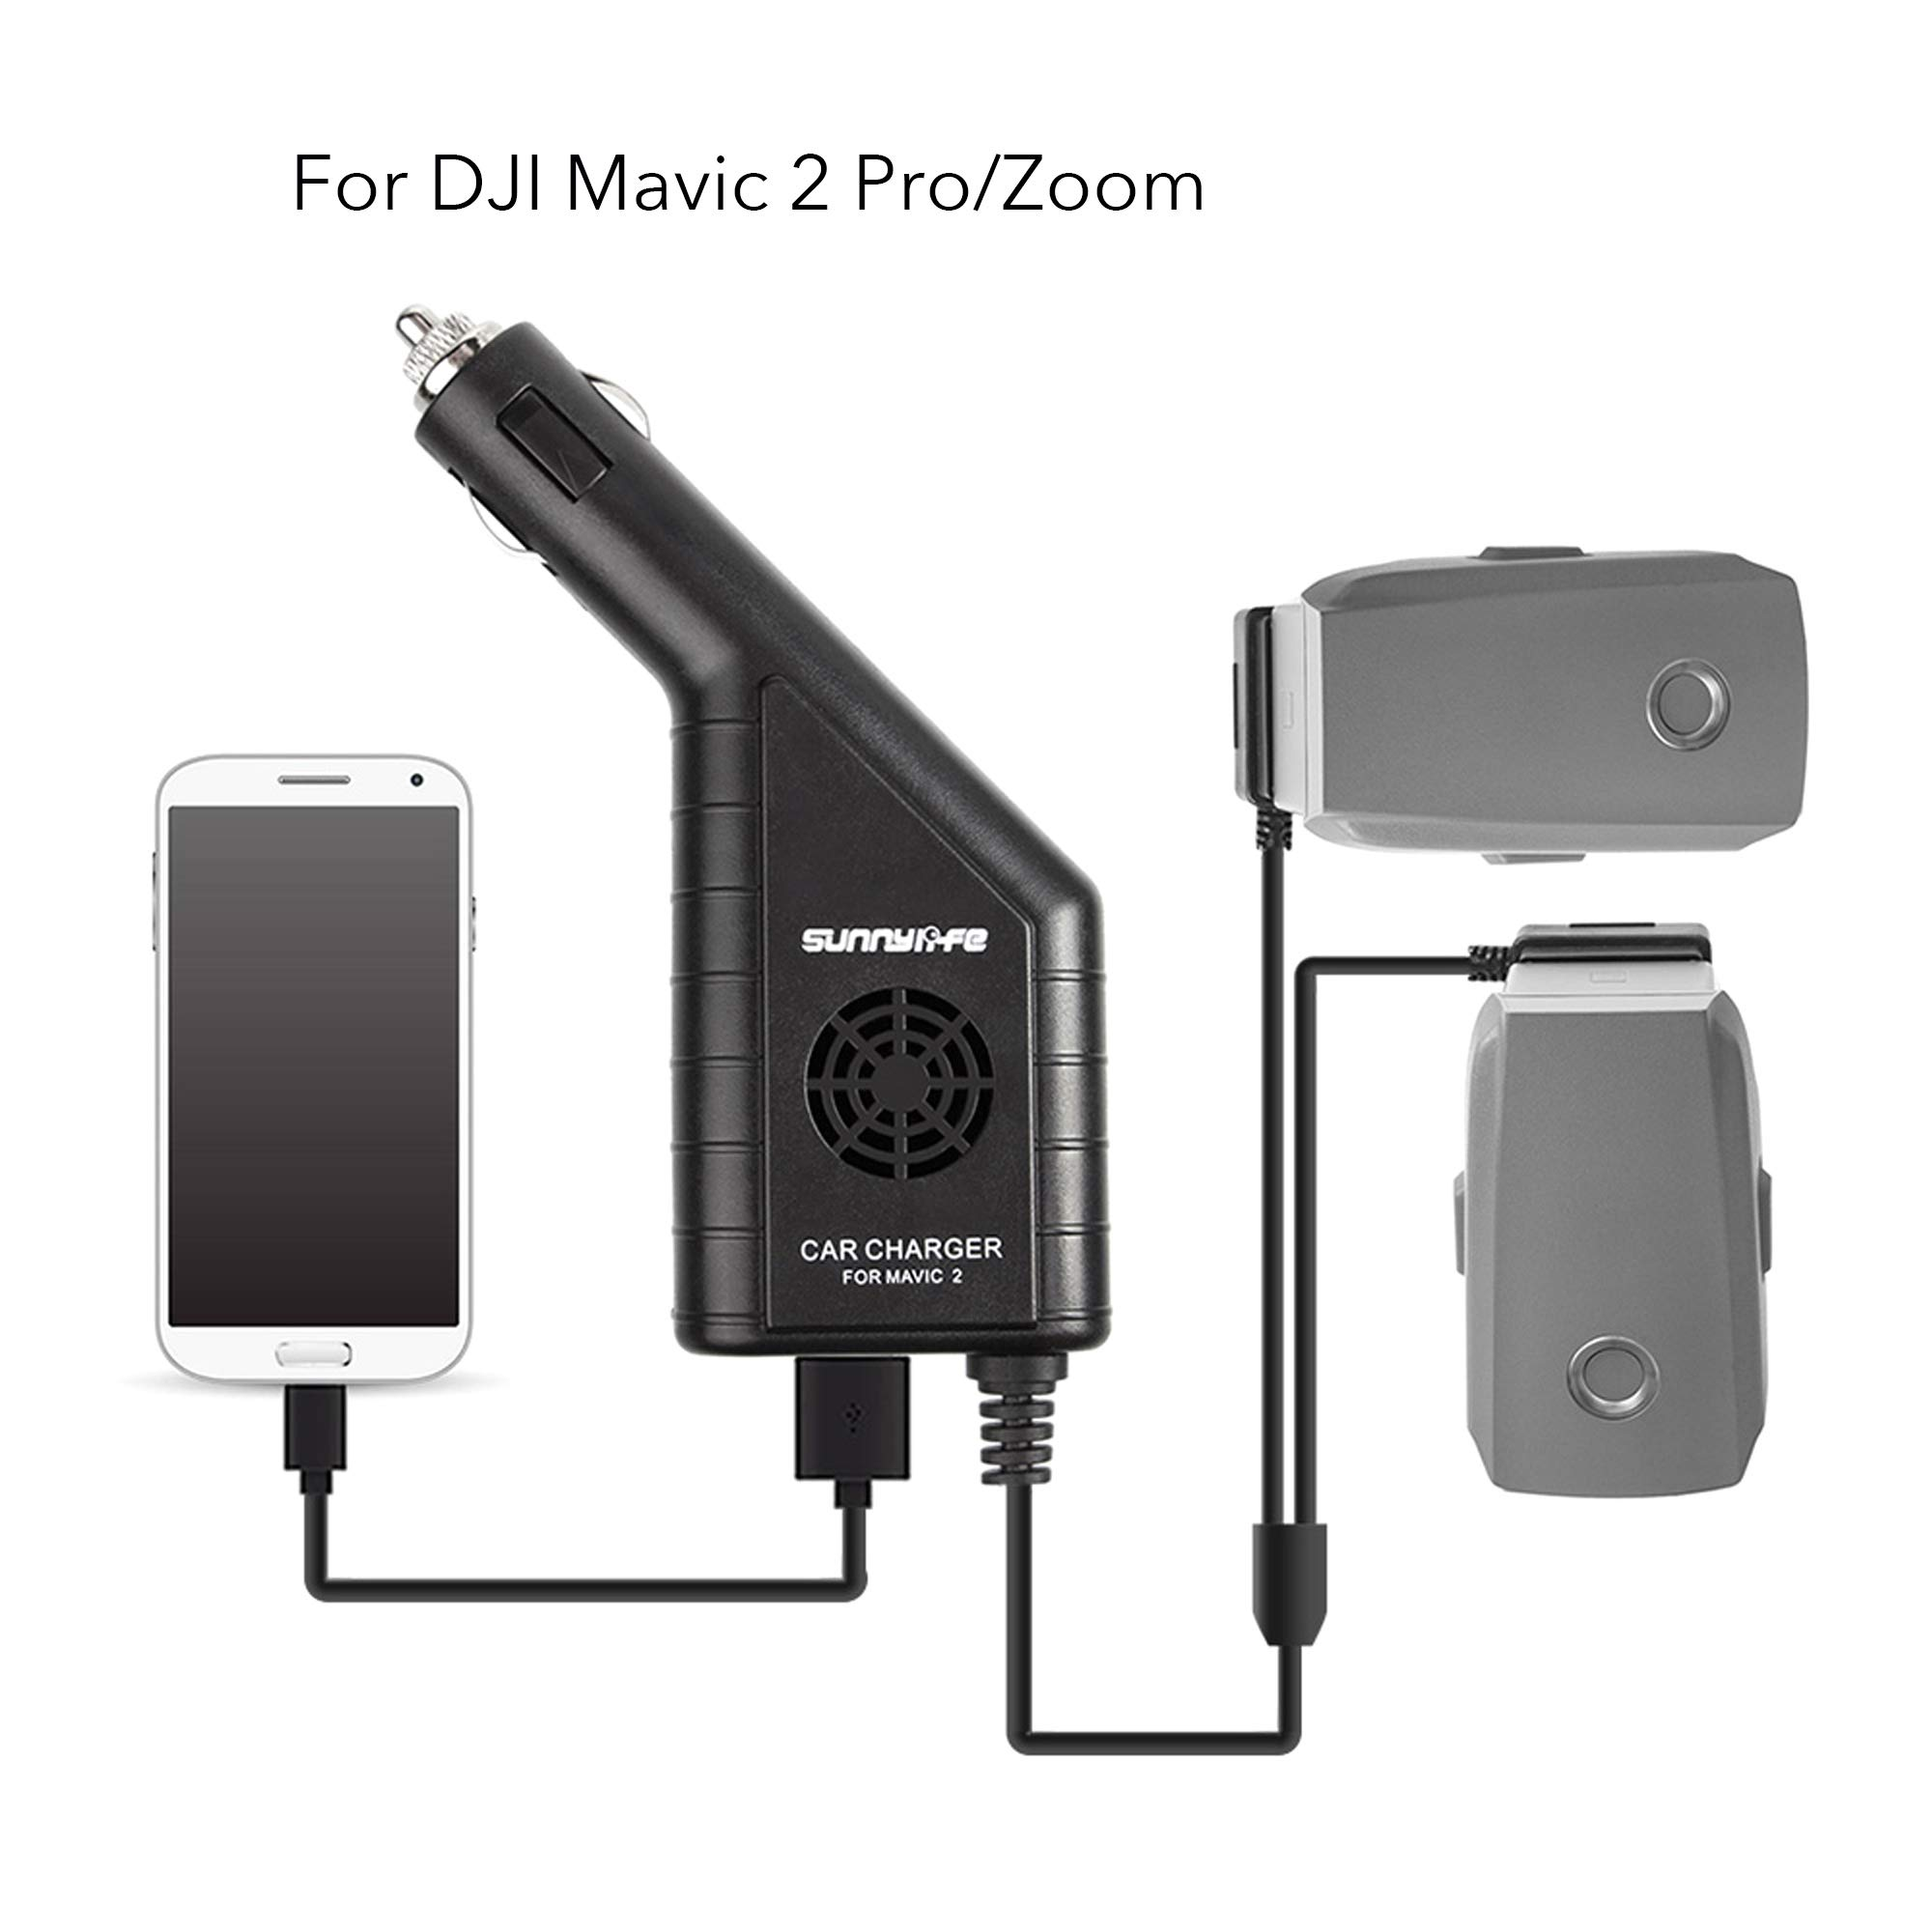 Cargador Para Auto Dji Mavic 2 Pro (7gyt15wc)